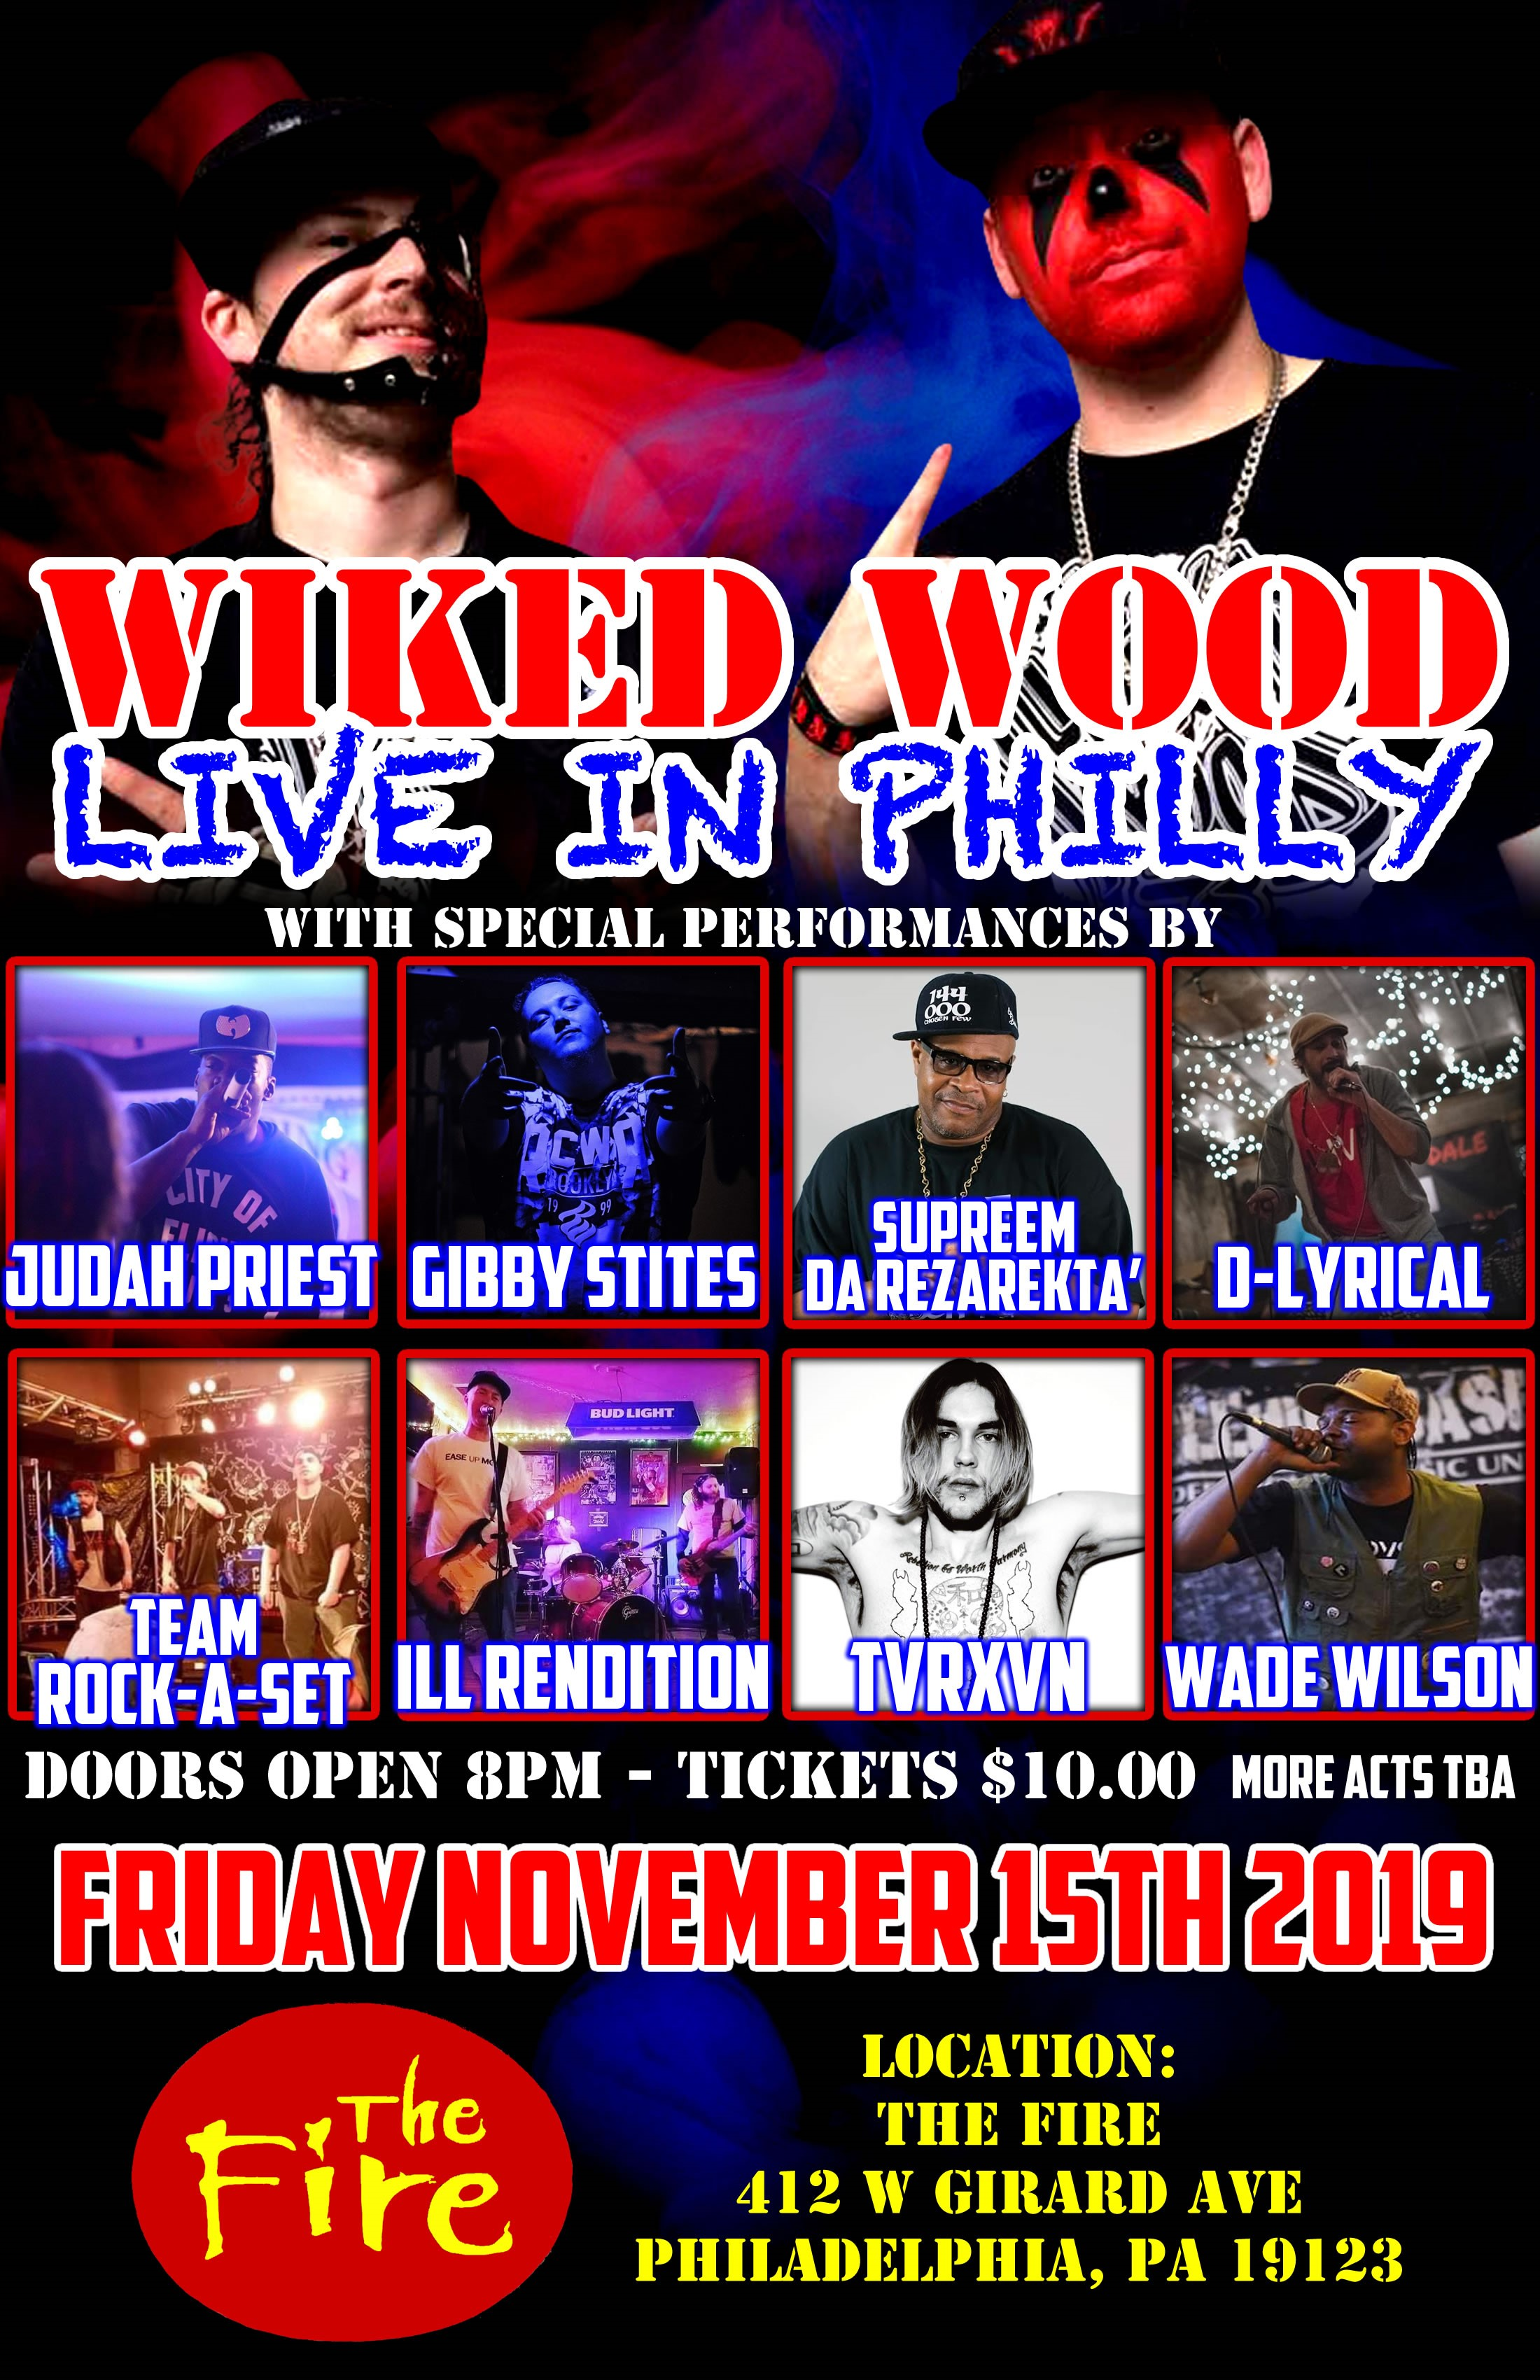 Wiked Wood LIVE - Philadelphia, PA